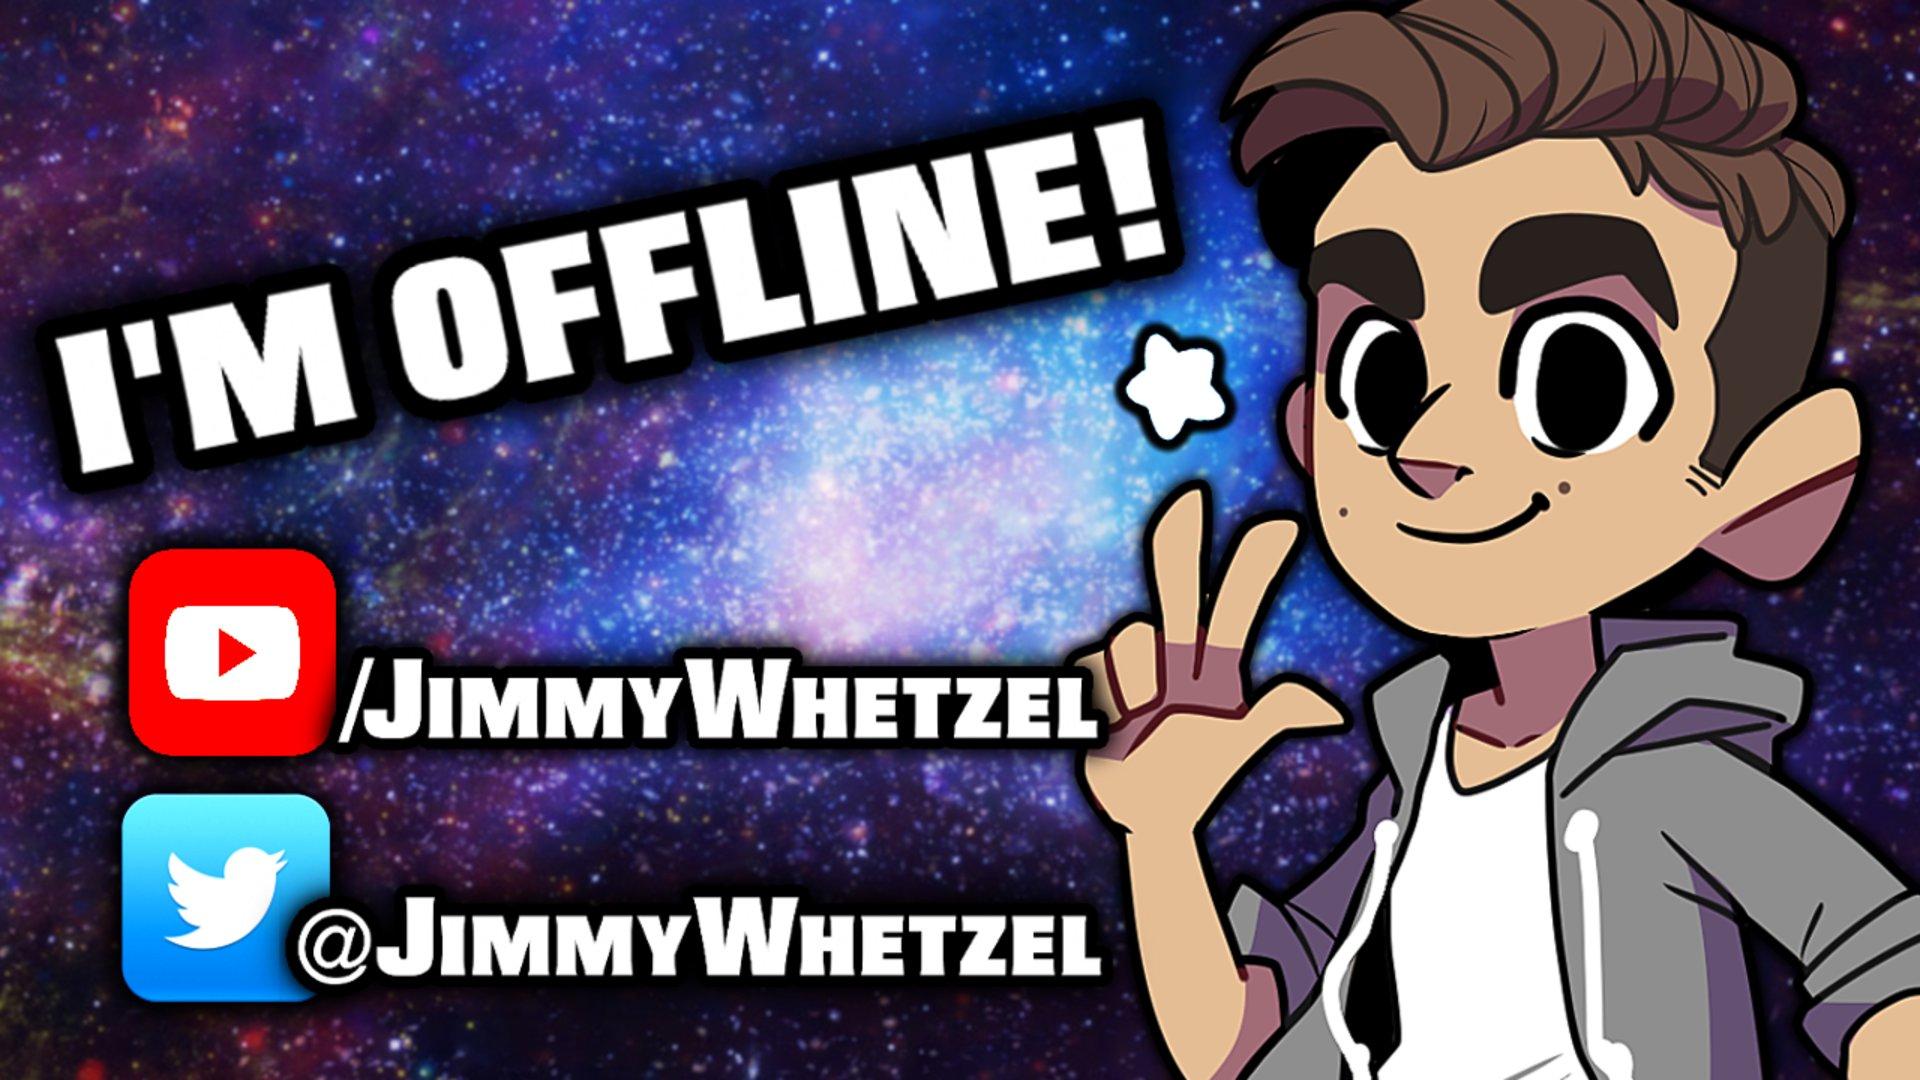 Twitch stream of JimmyWhetzel